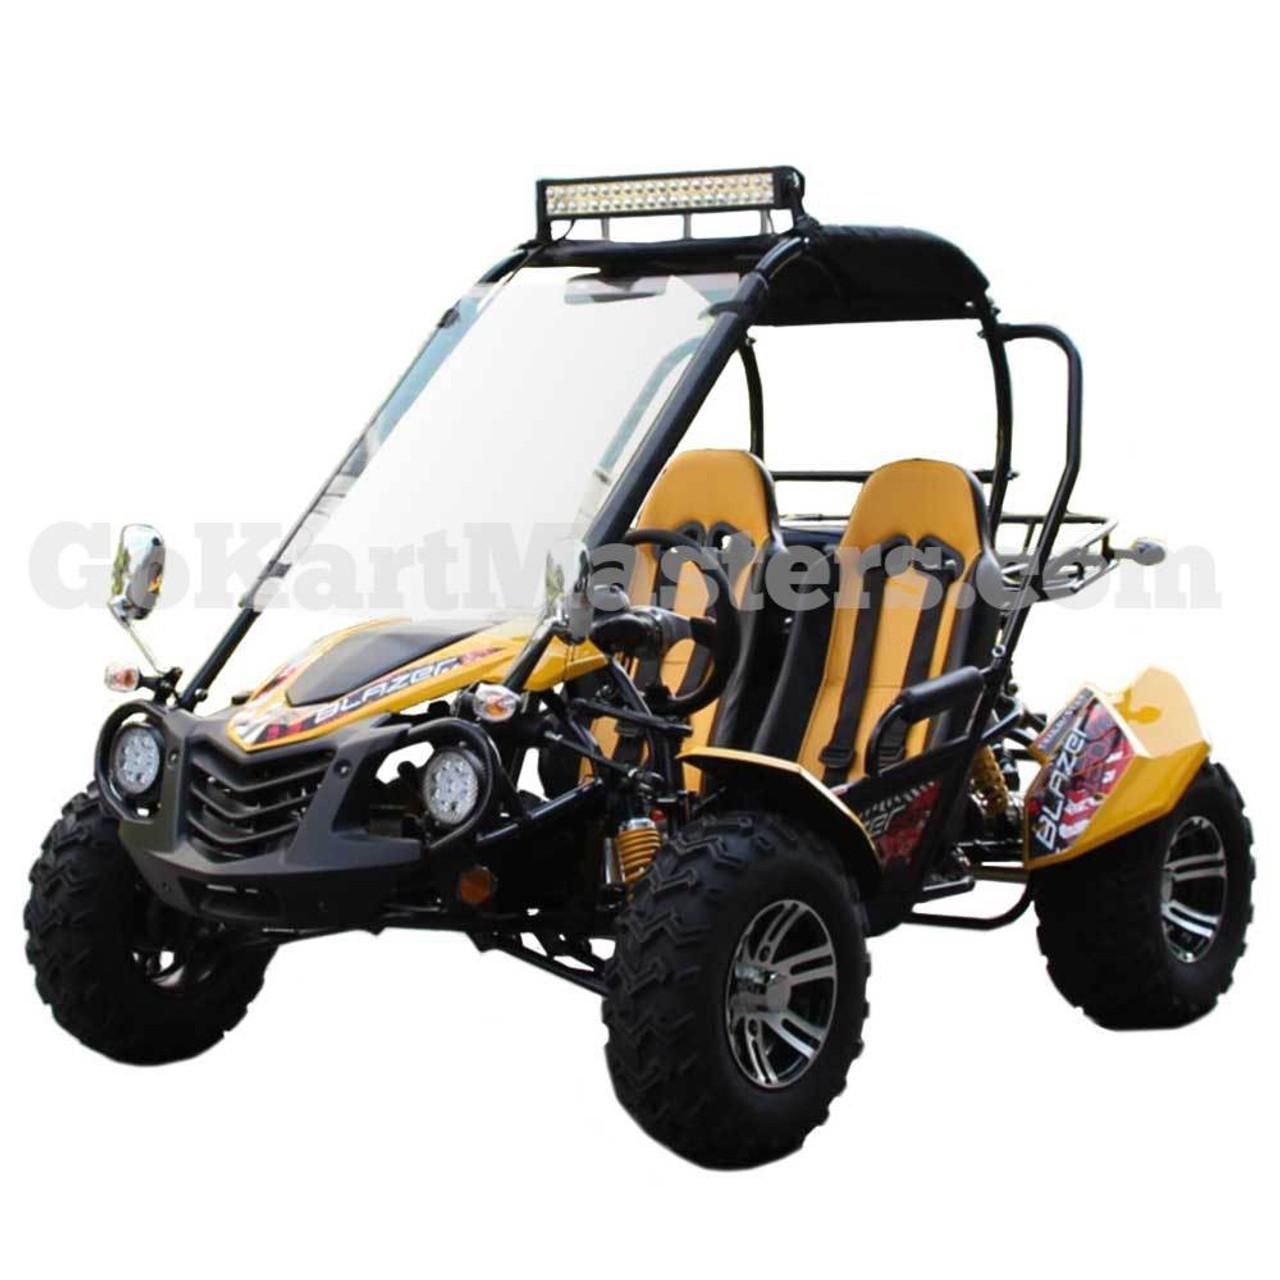 TrailMaster Blazer 150X Go Kart - Ships FREE!!! - Yellow